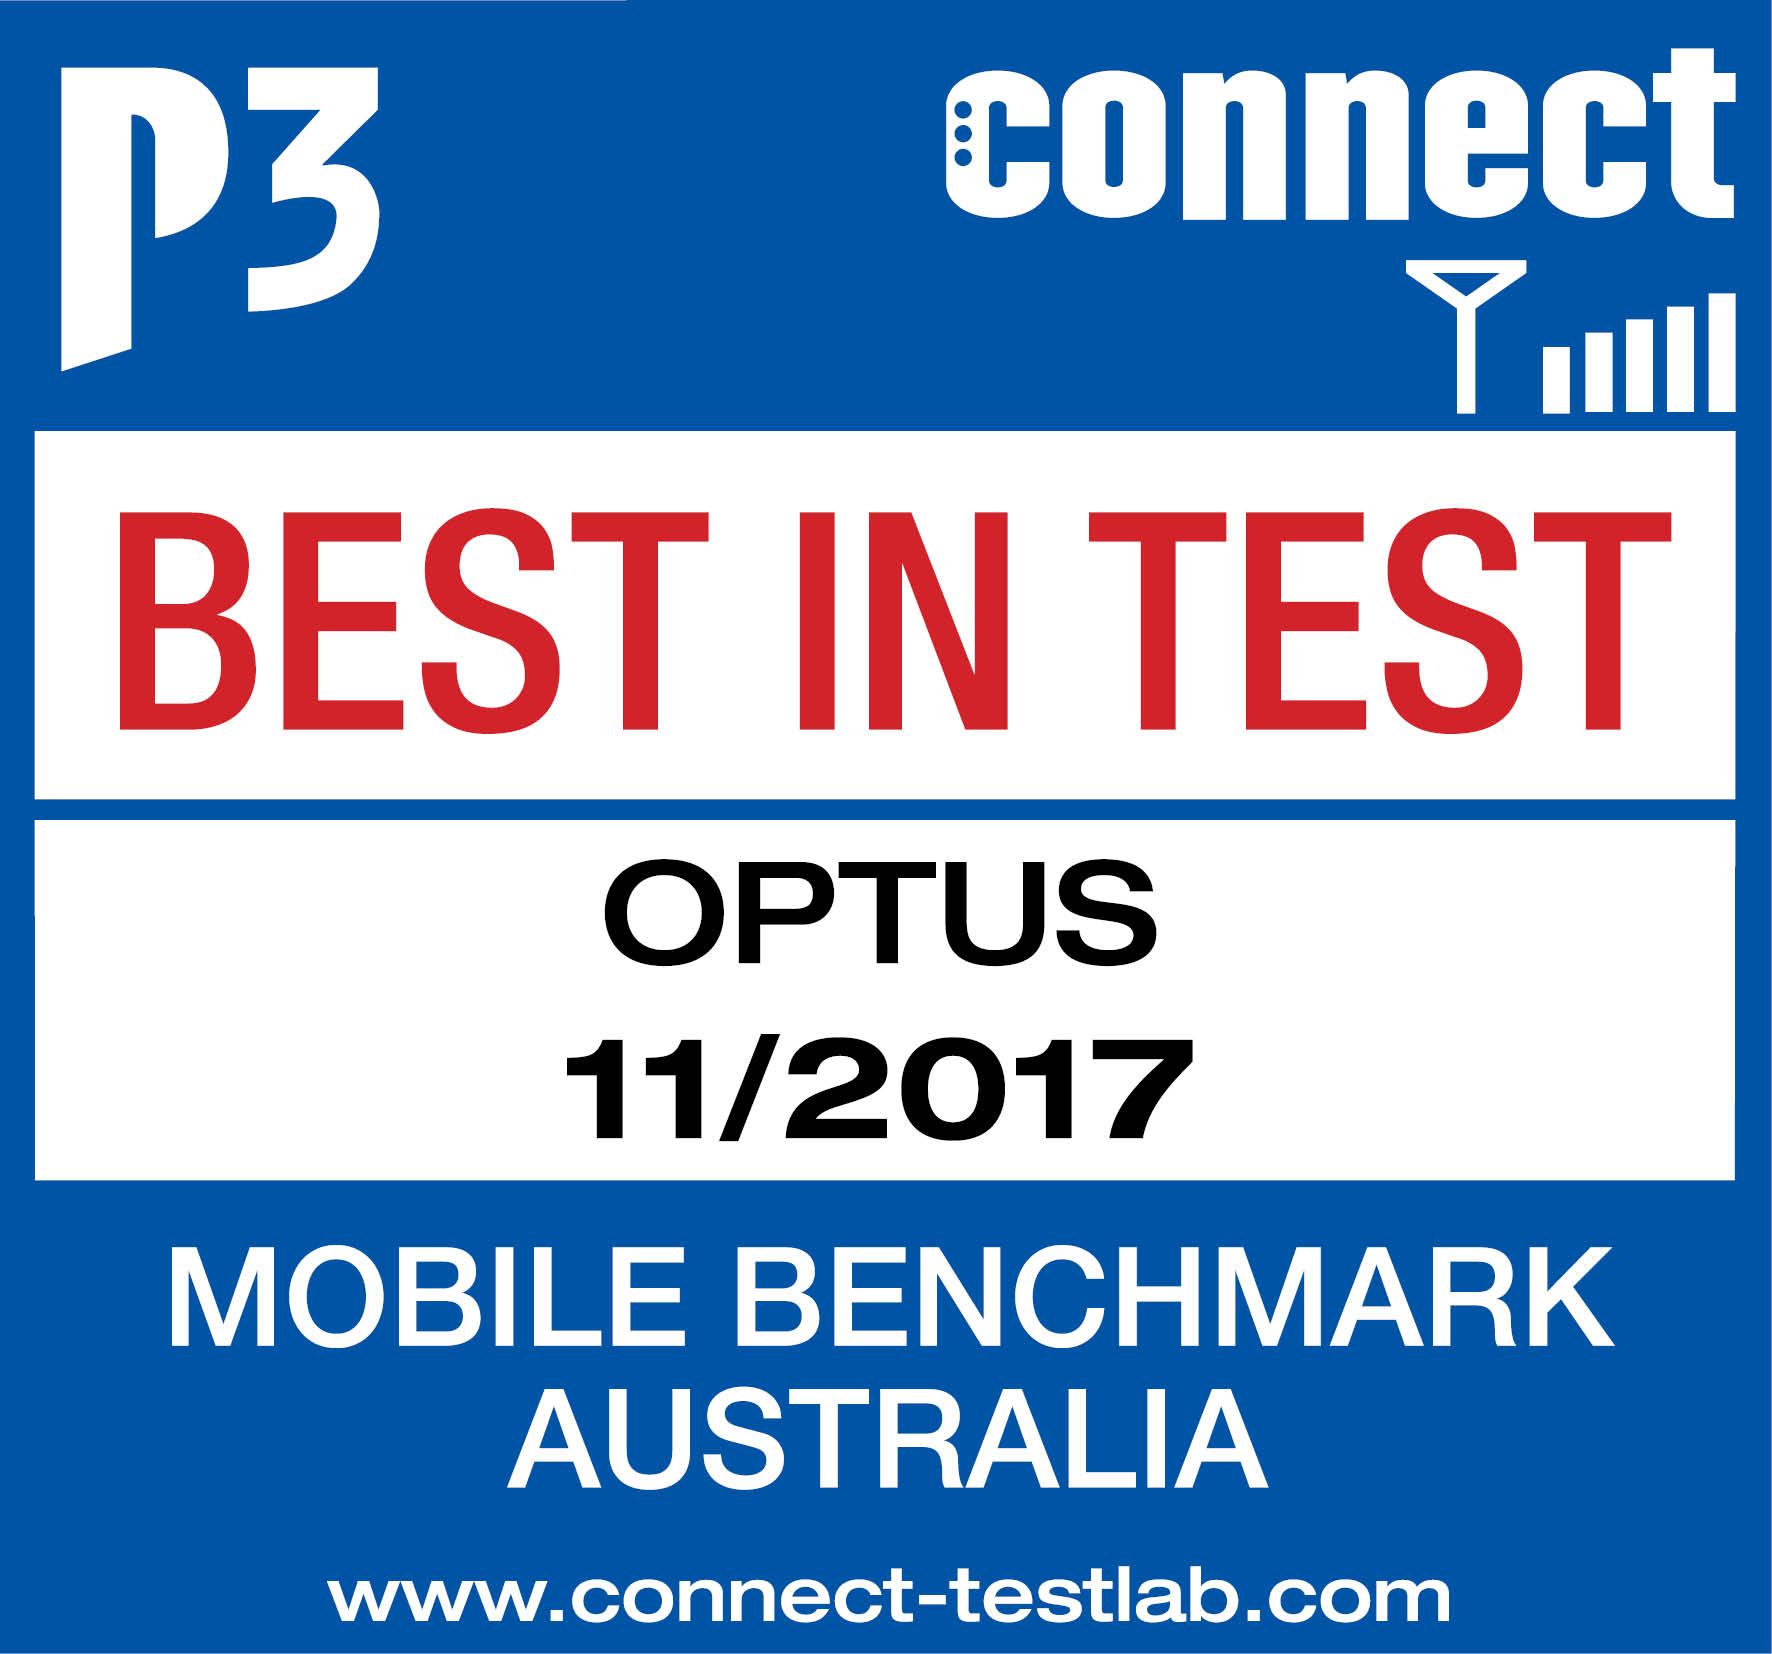 Testlogo_Benchmark_Best in Test_OPTUS.jpg